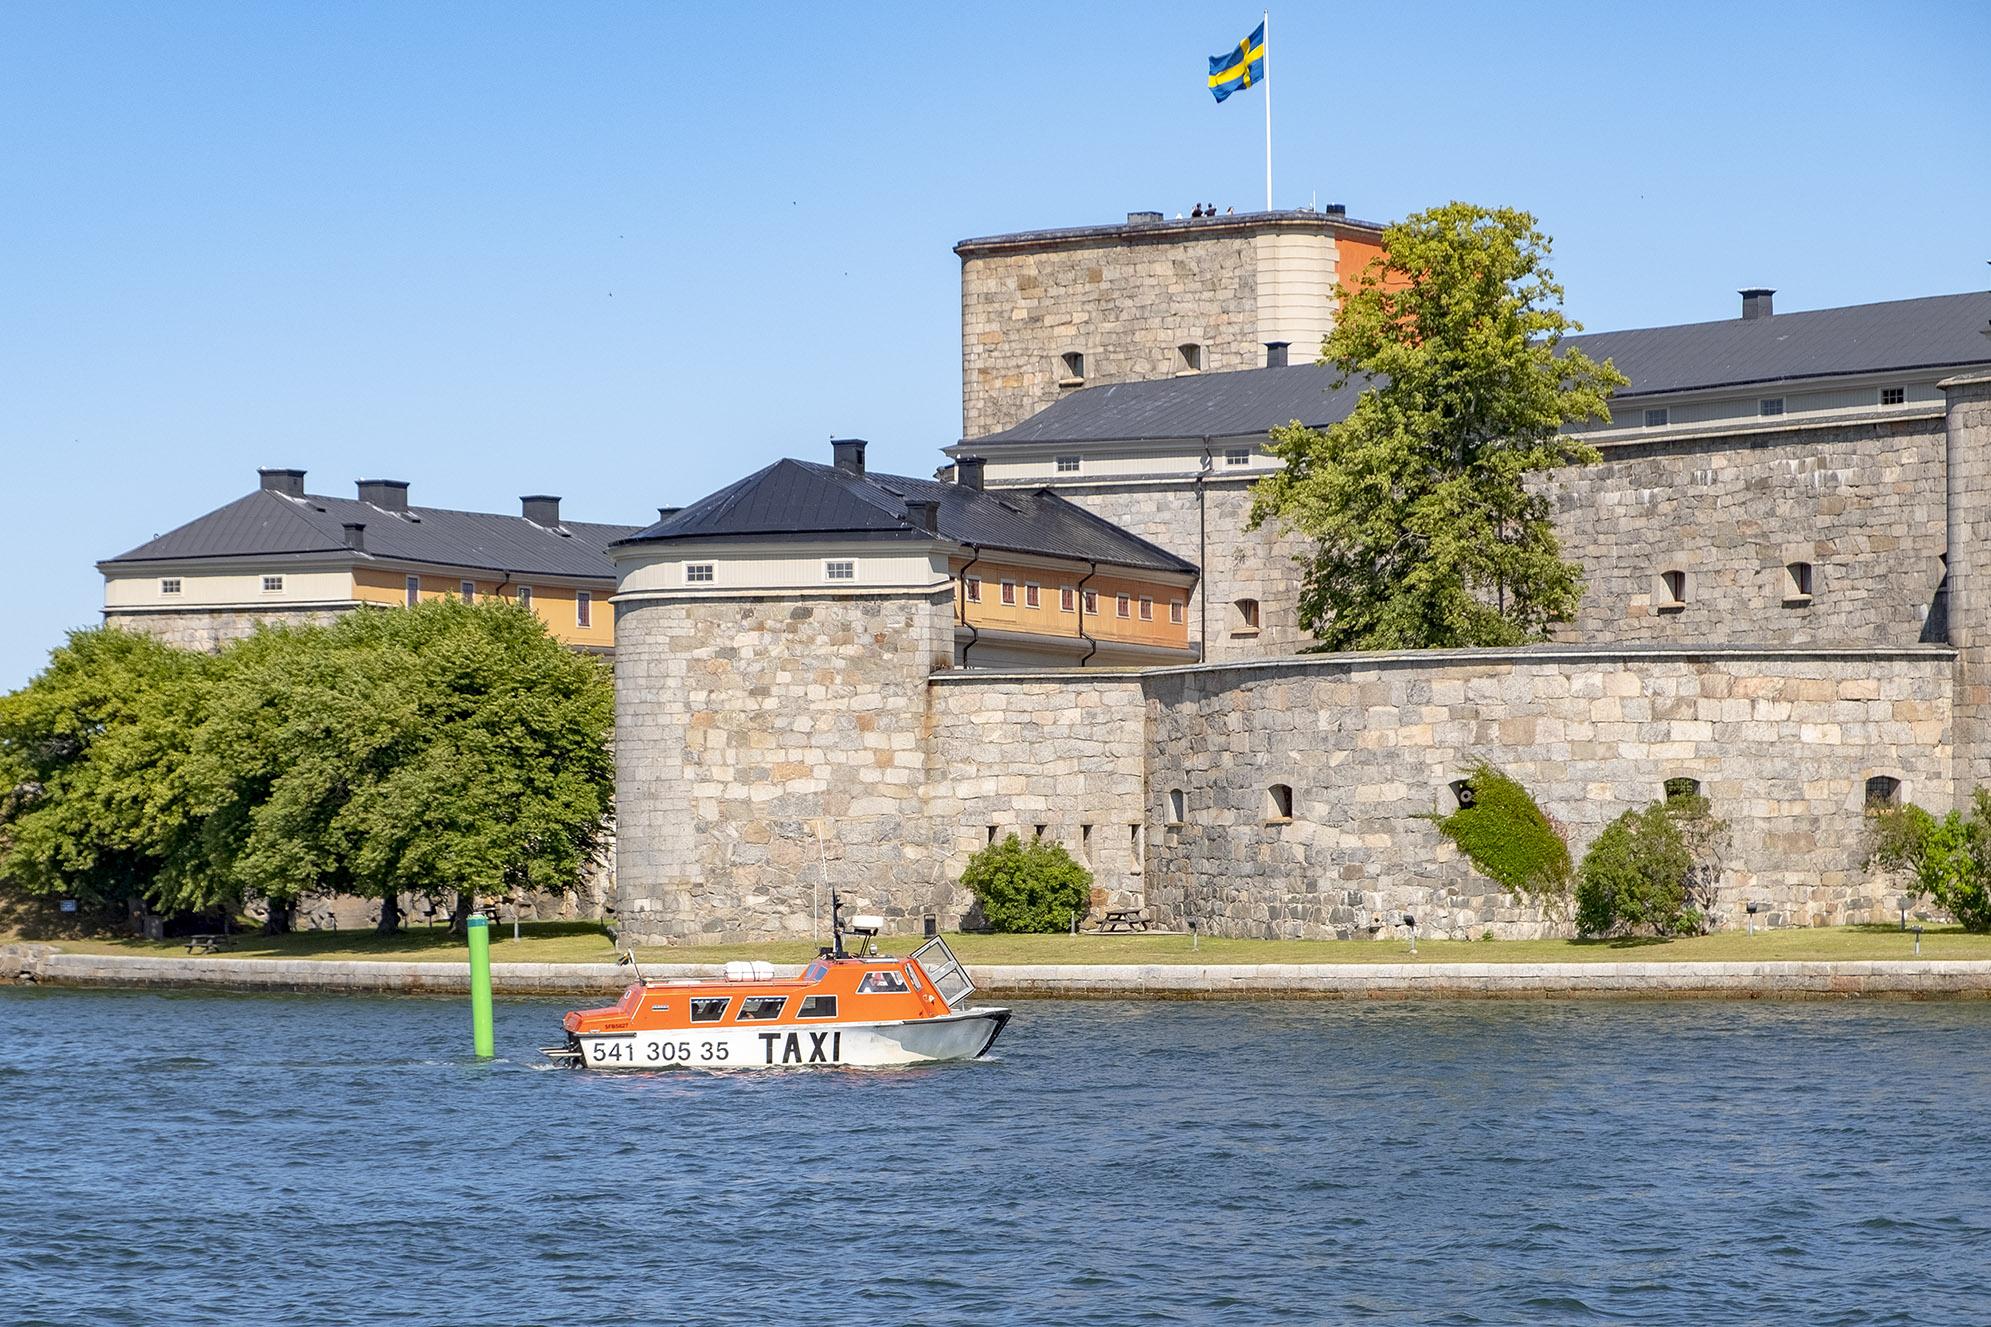 Taxibåt Vaxholms kastell